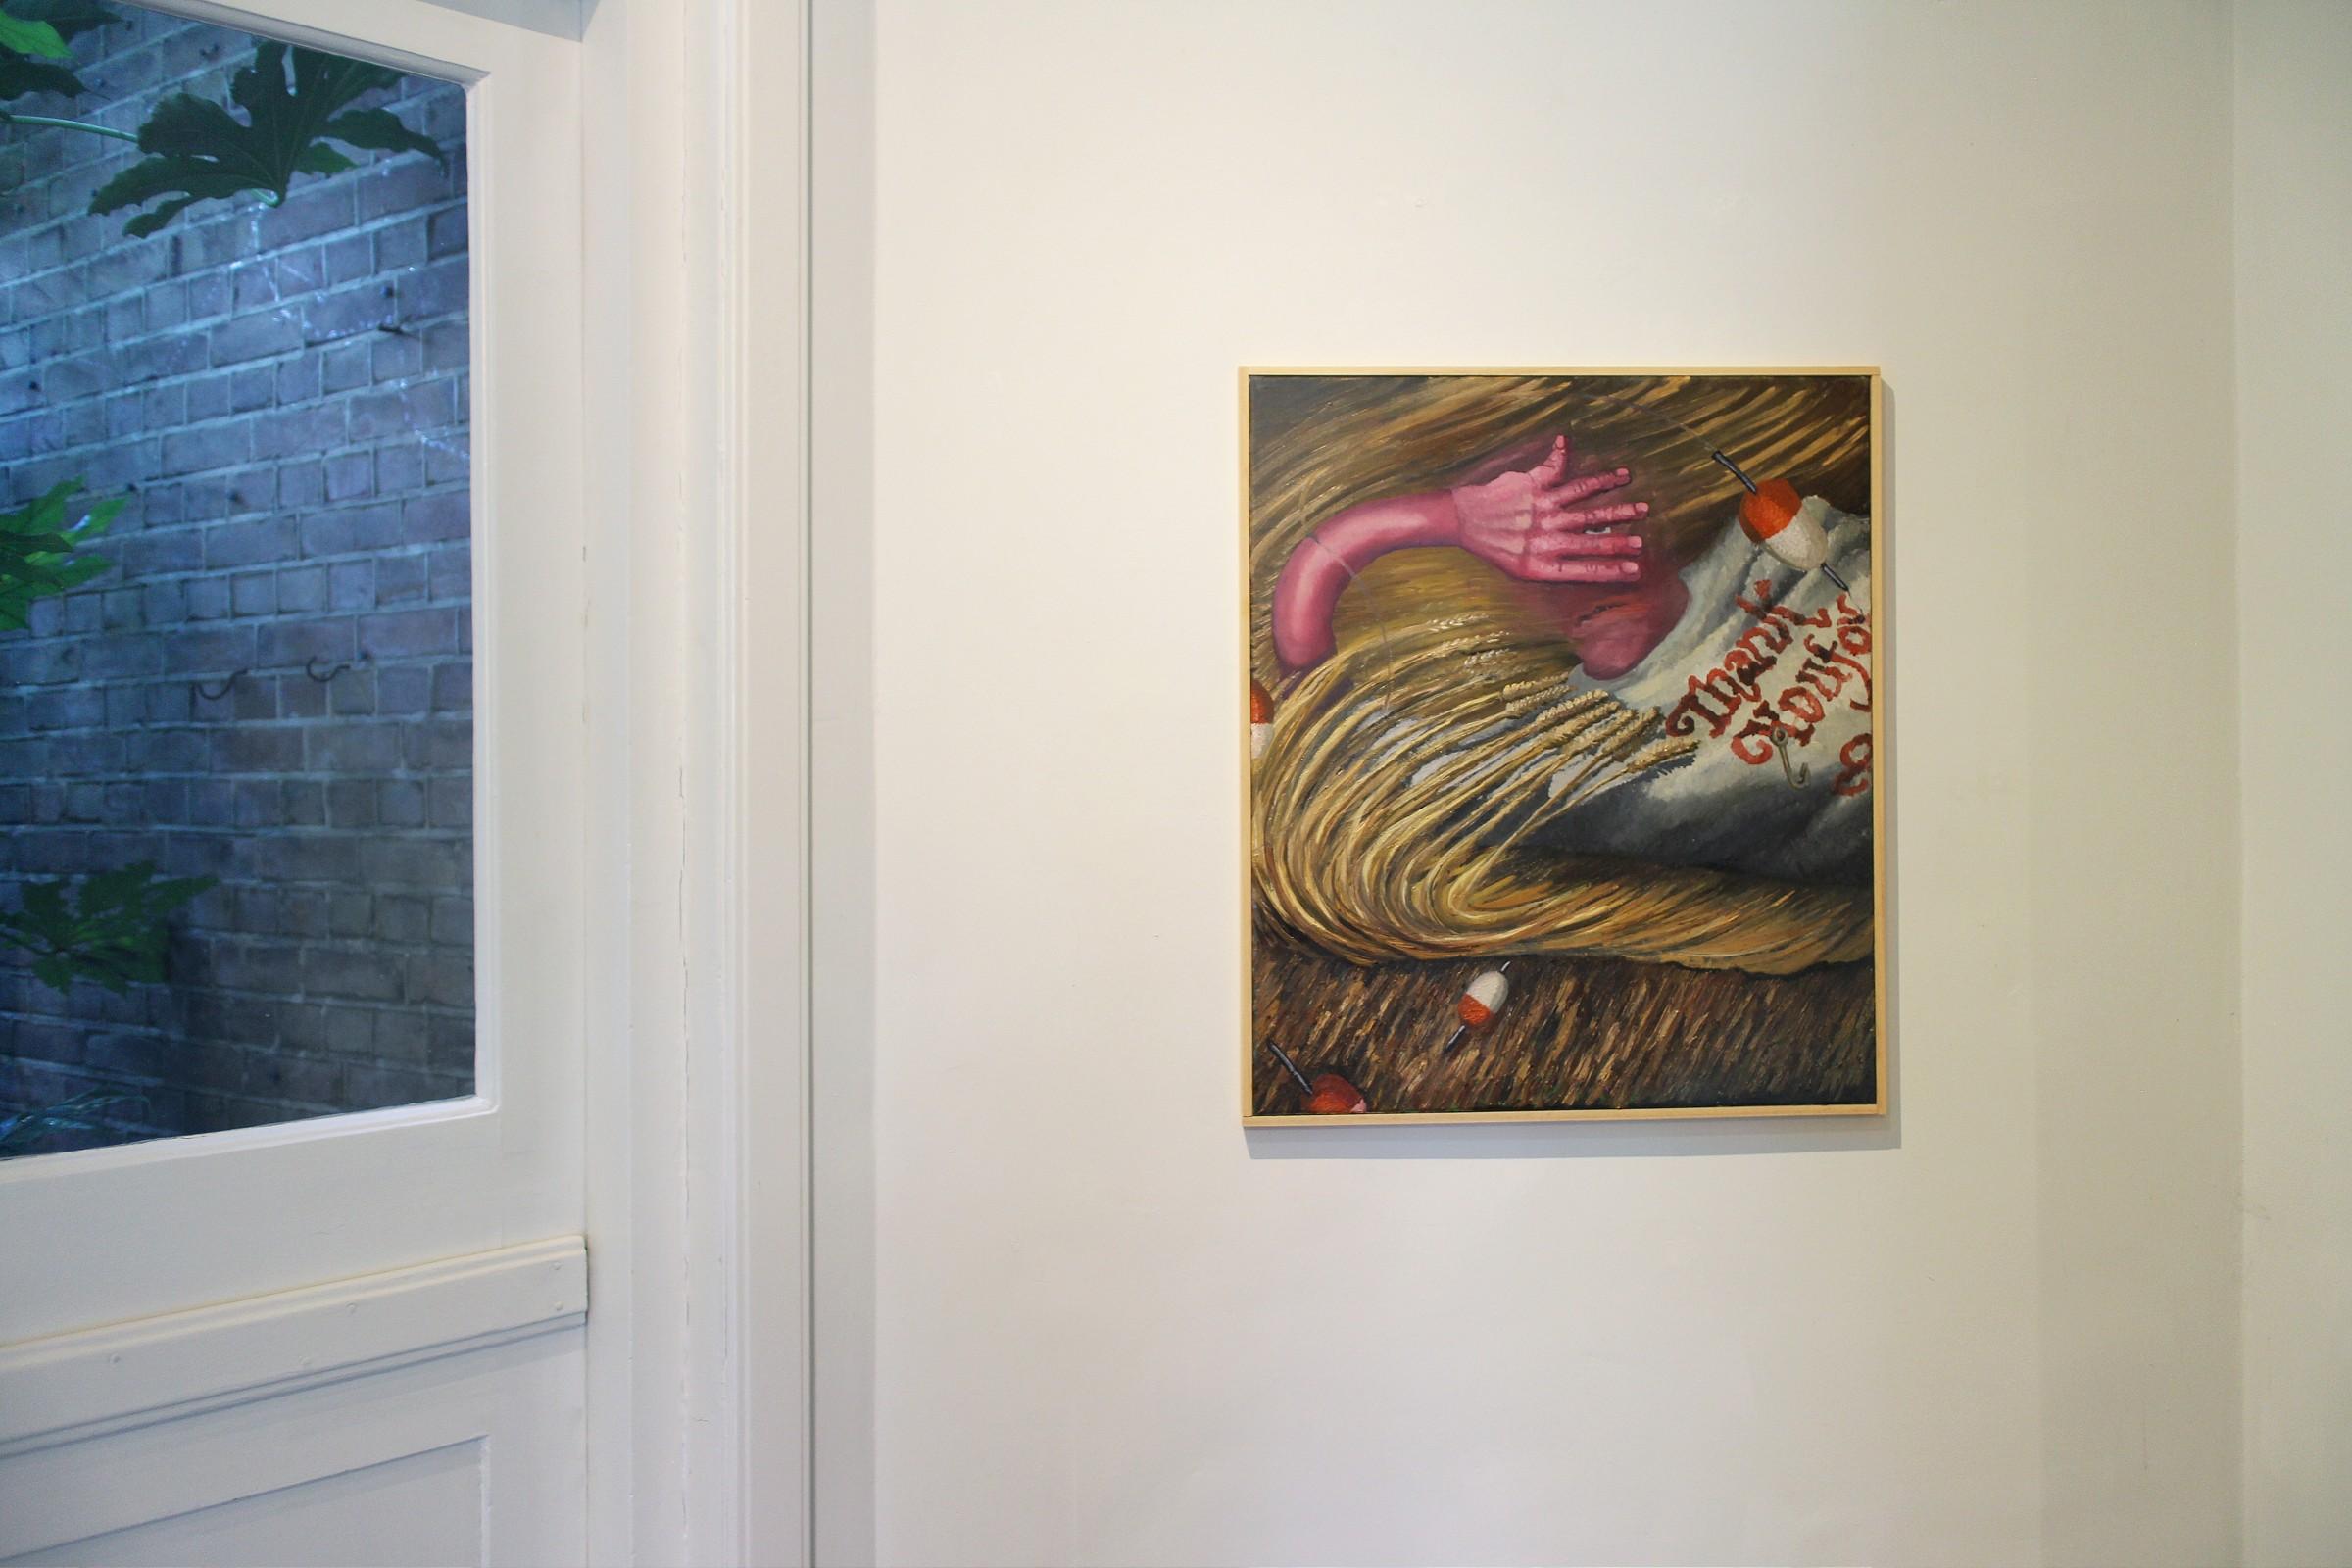 """DontGiveADamns"" na galeria Marian Cramer Projects Artes & contextos dontgiveadamns27"